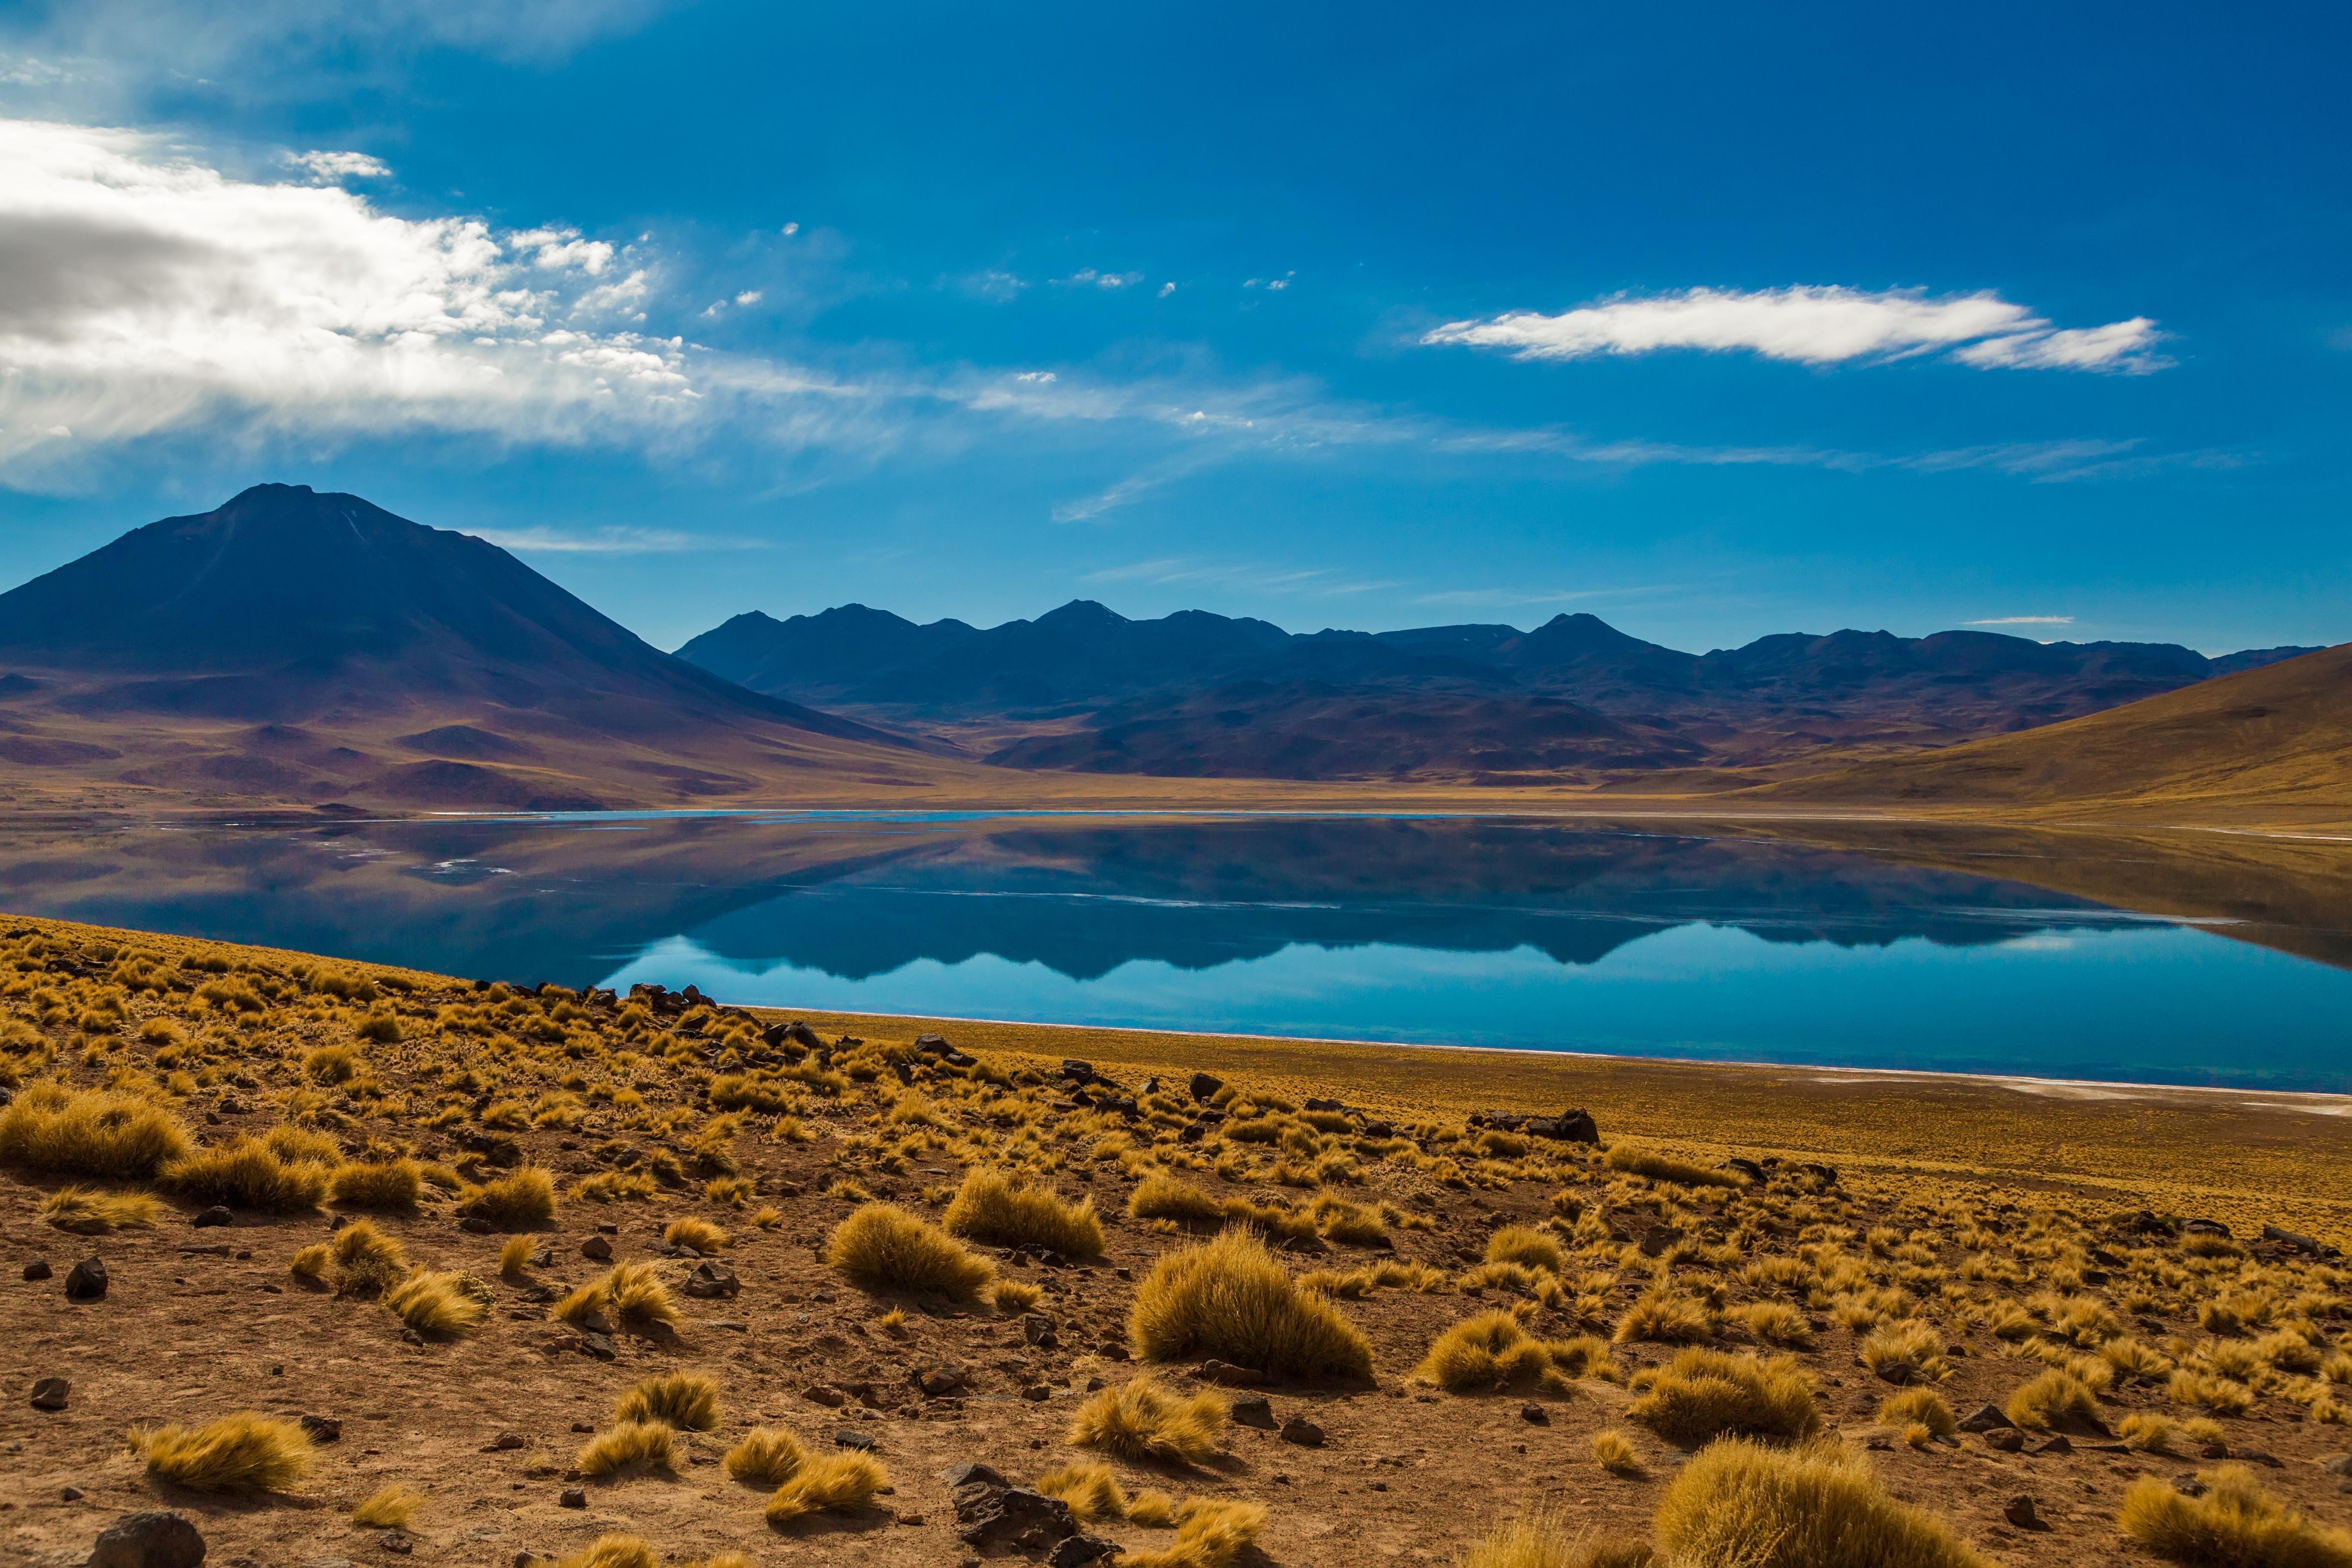 How to Spend 2 Days in San Pedro de Atacama